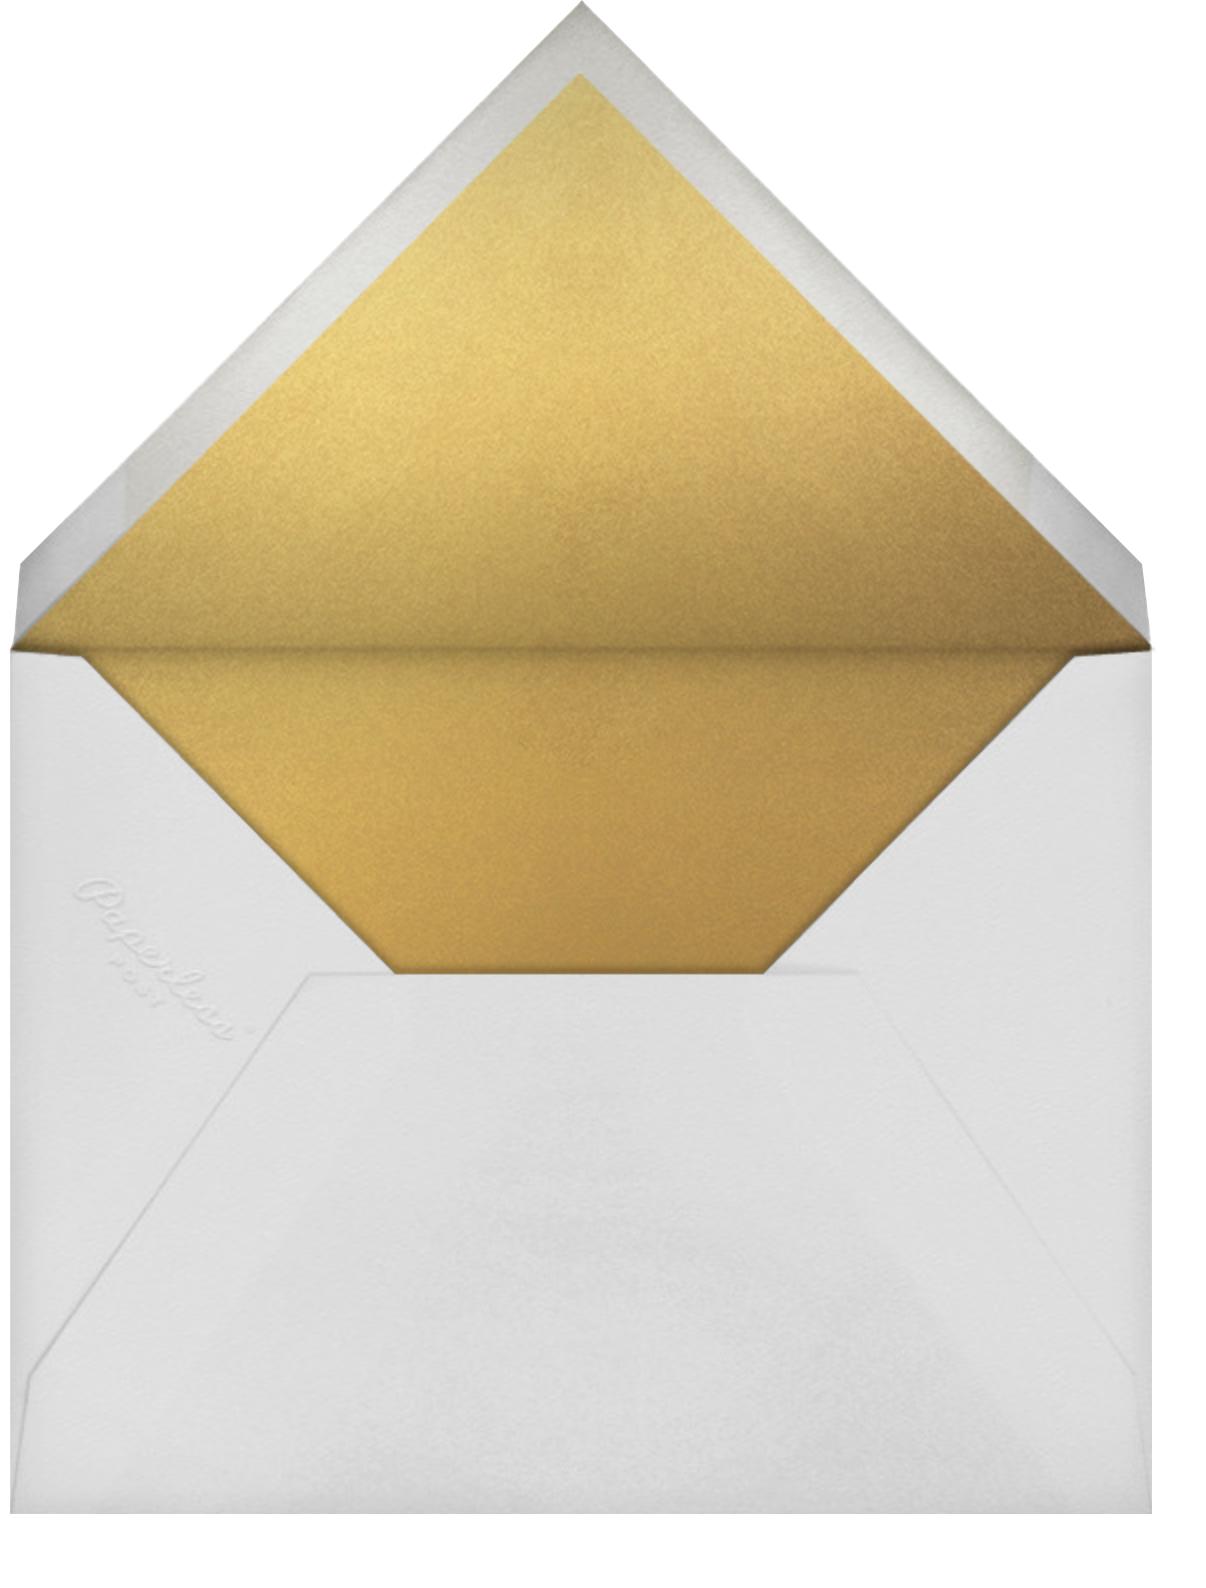 Forsythia - Medium Gold - Crane & Co. - All - envelope back